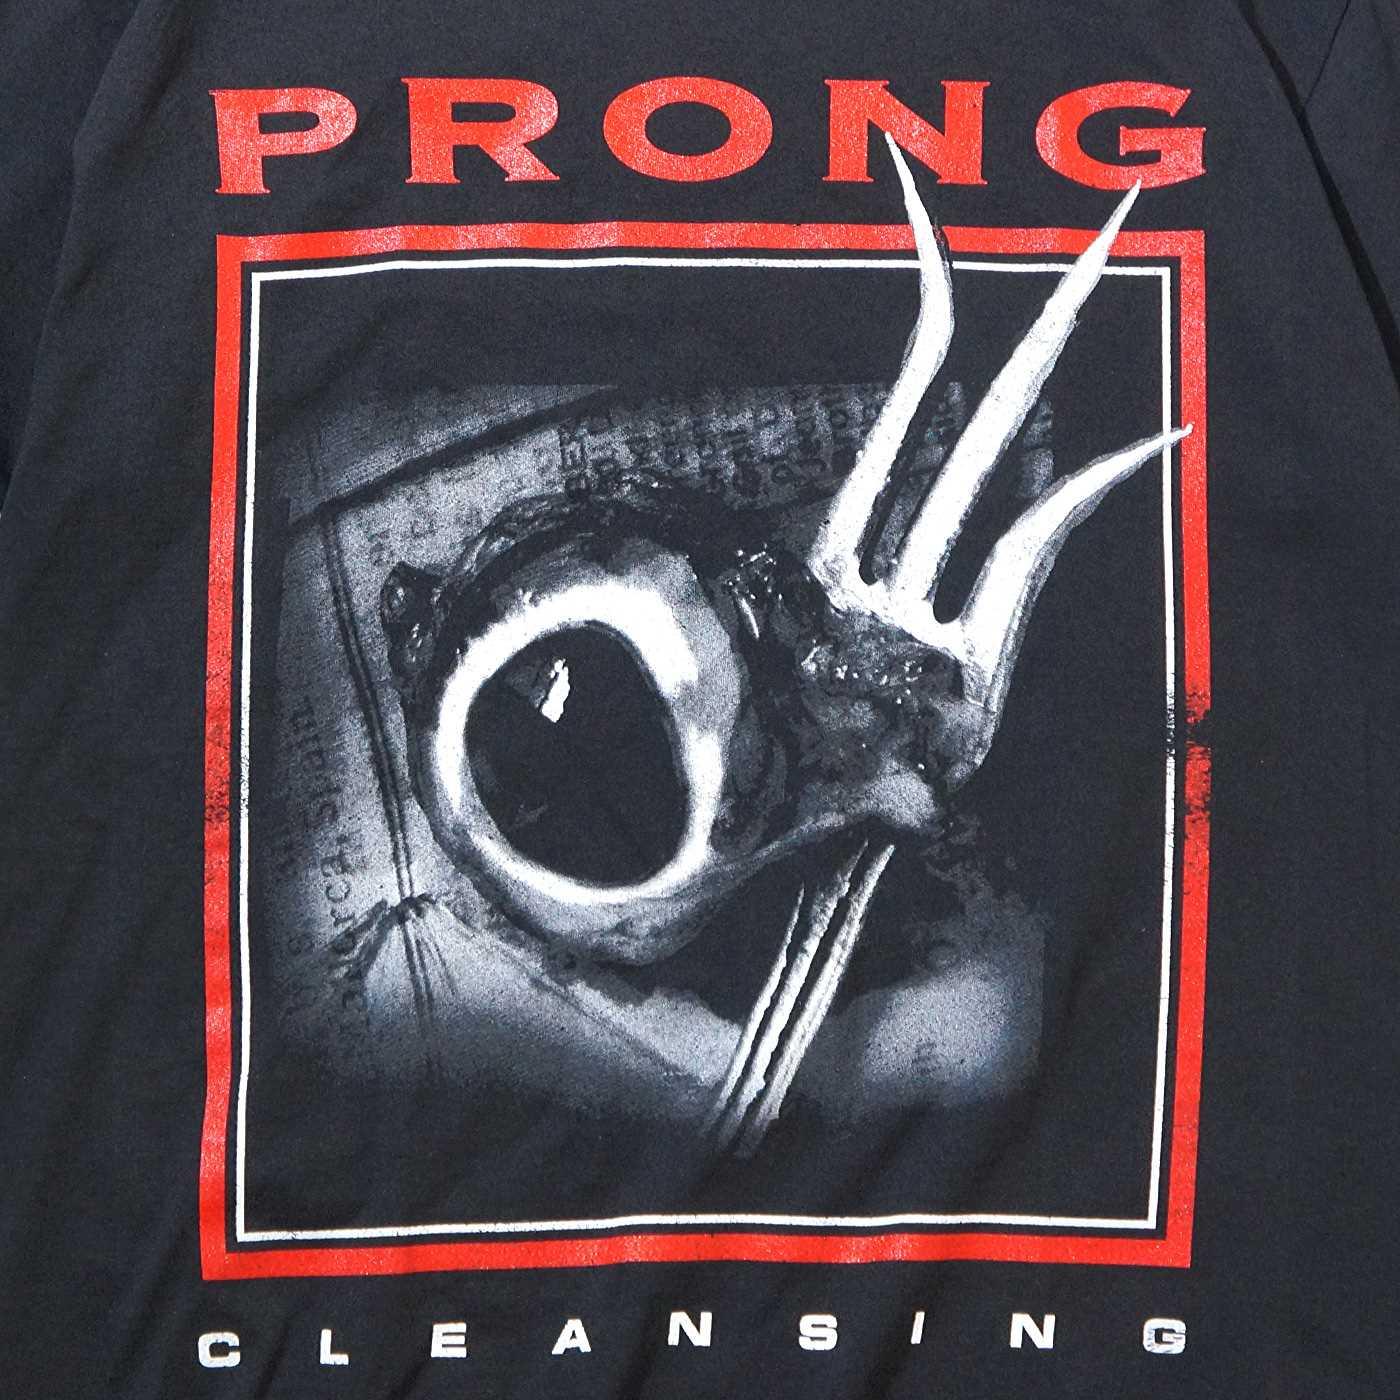 PRONG プロング Tシャツ Cleansing-Black